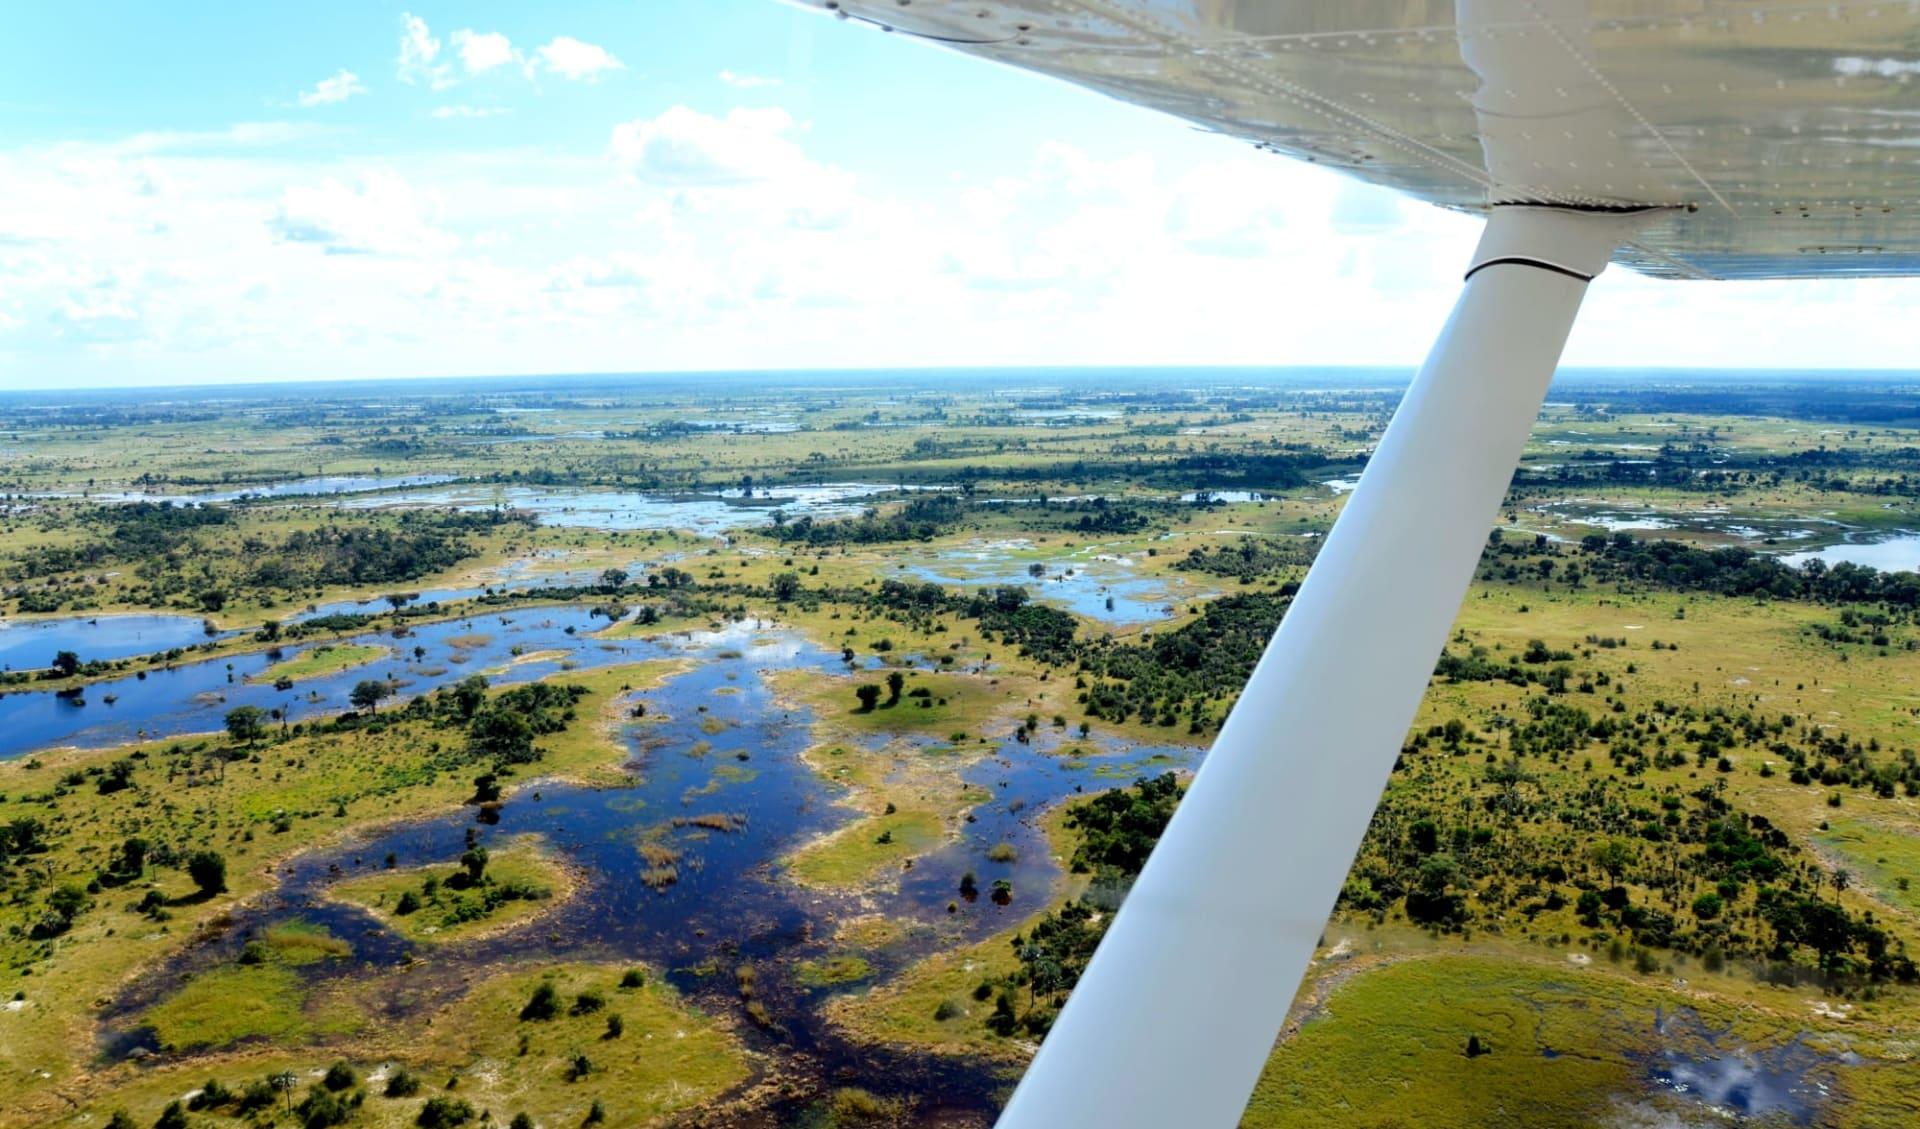 Botswana Royal ab Linyanti Region: Botswana - Okavango Delta - Aussicht Flugzeug